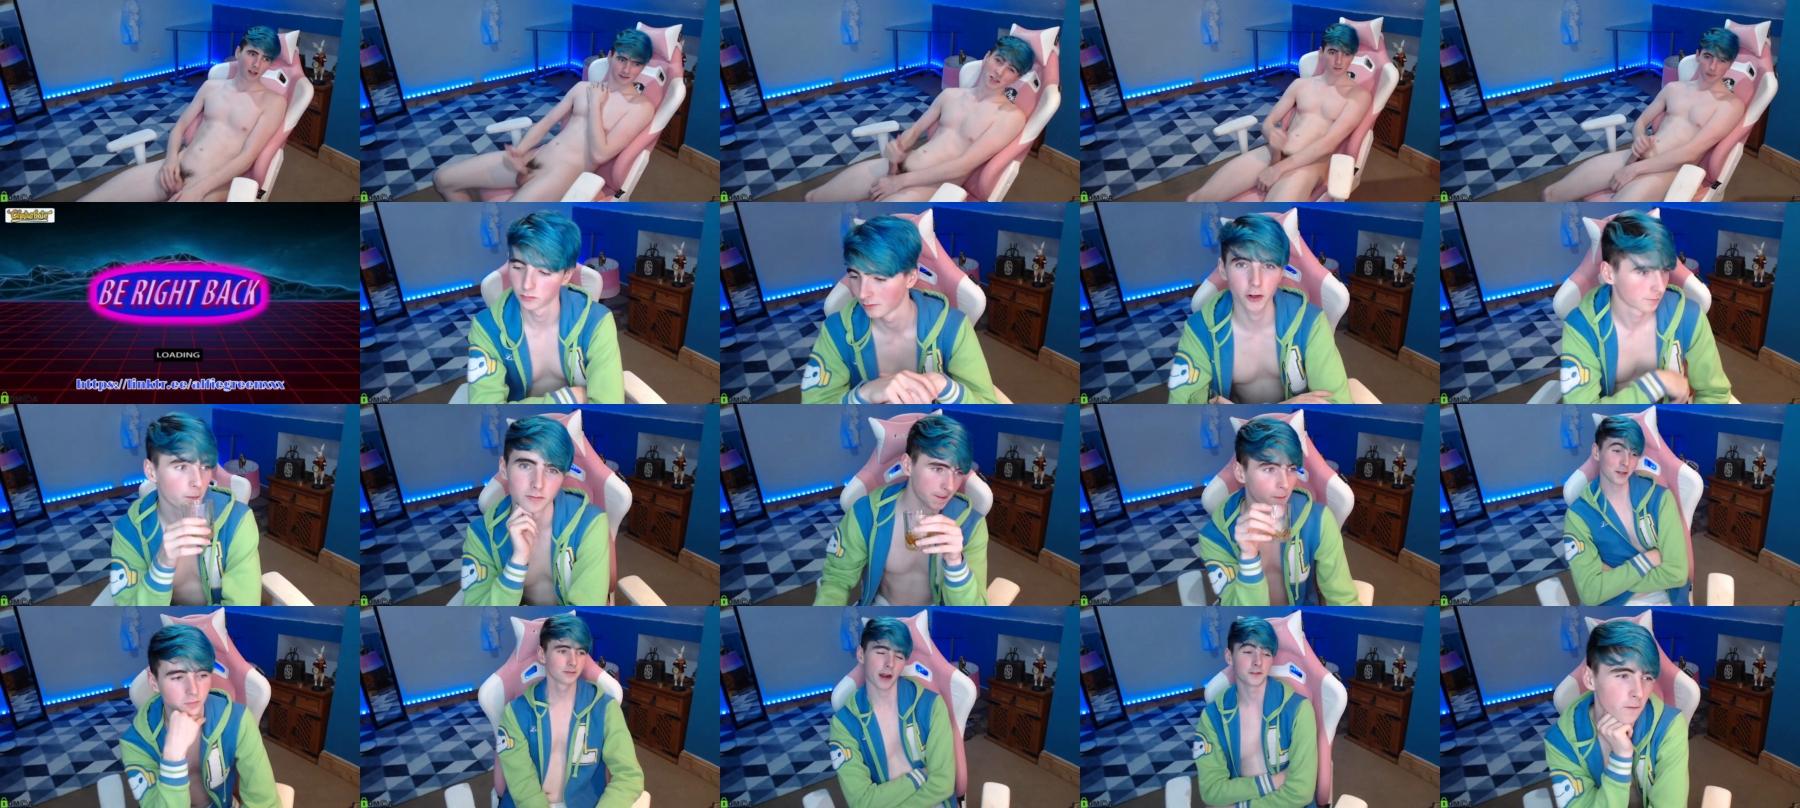 Alfiegreenxxx Chaturbate 18-09-2021 video cutie